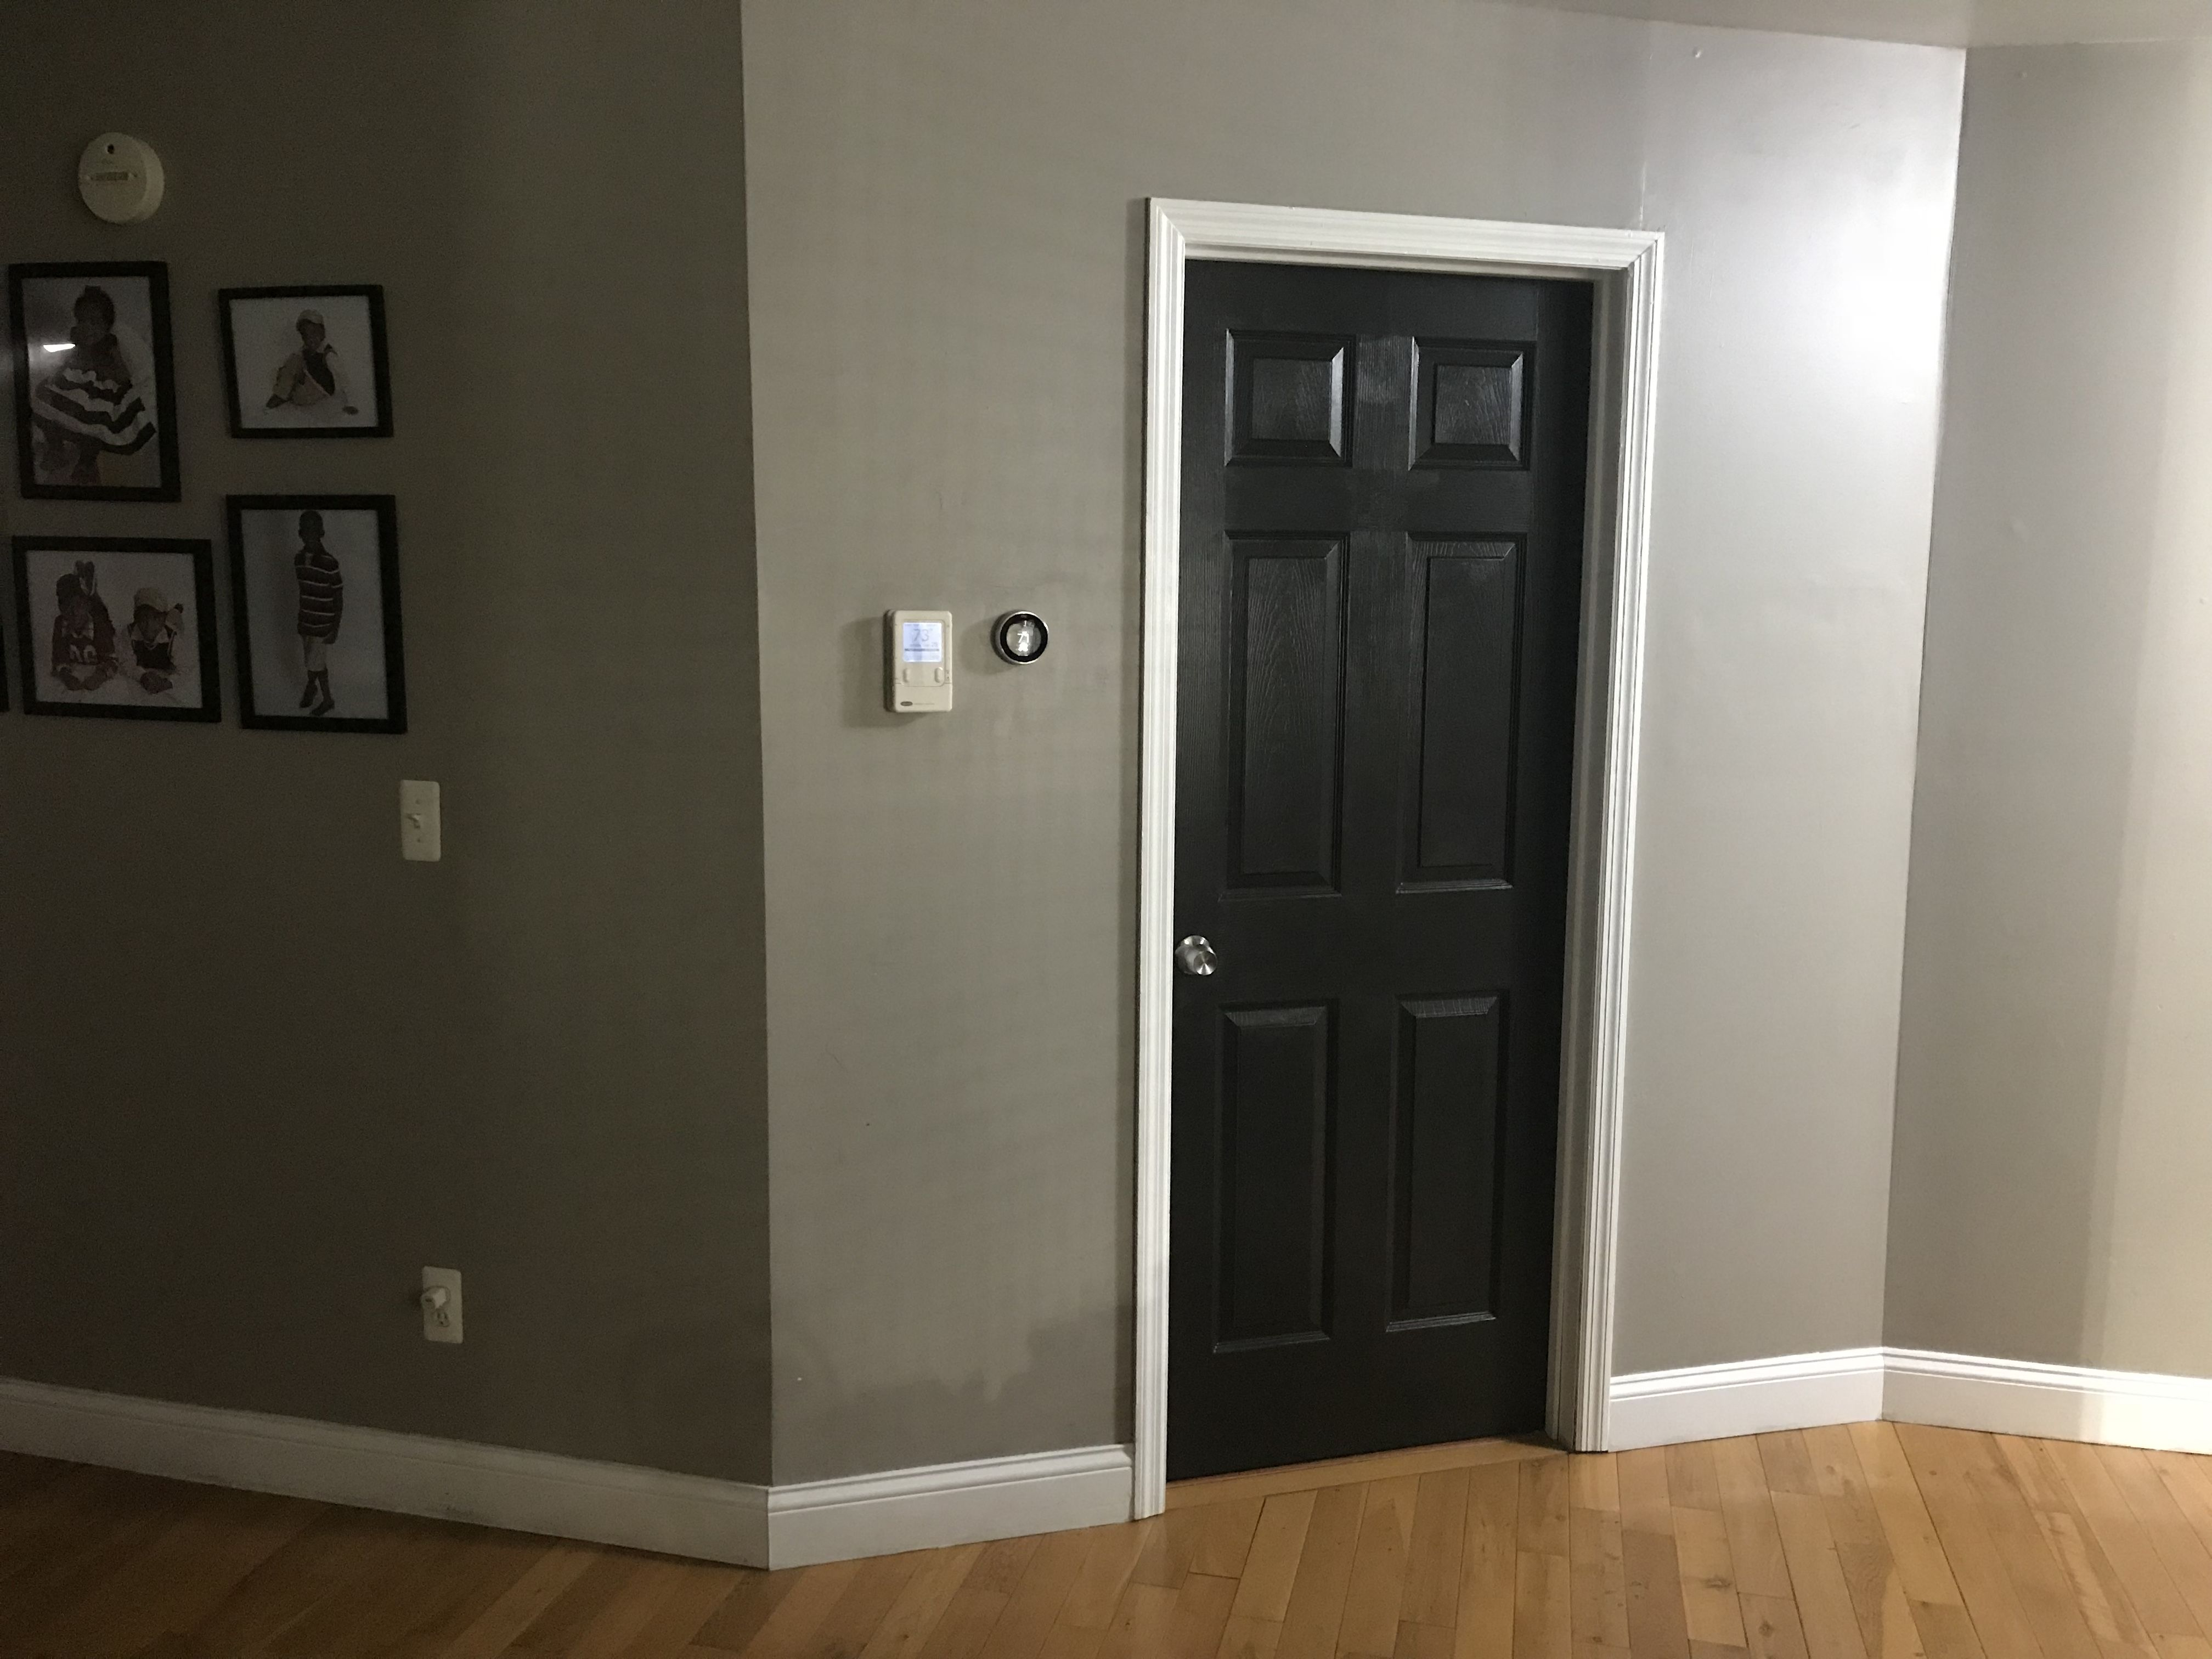 Hallway Door Painted Black Using Behr Black Mocha And Walls